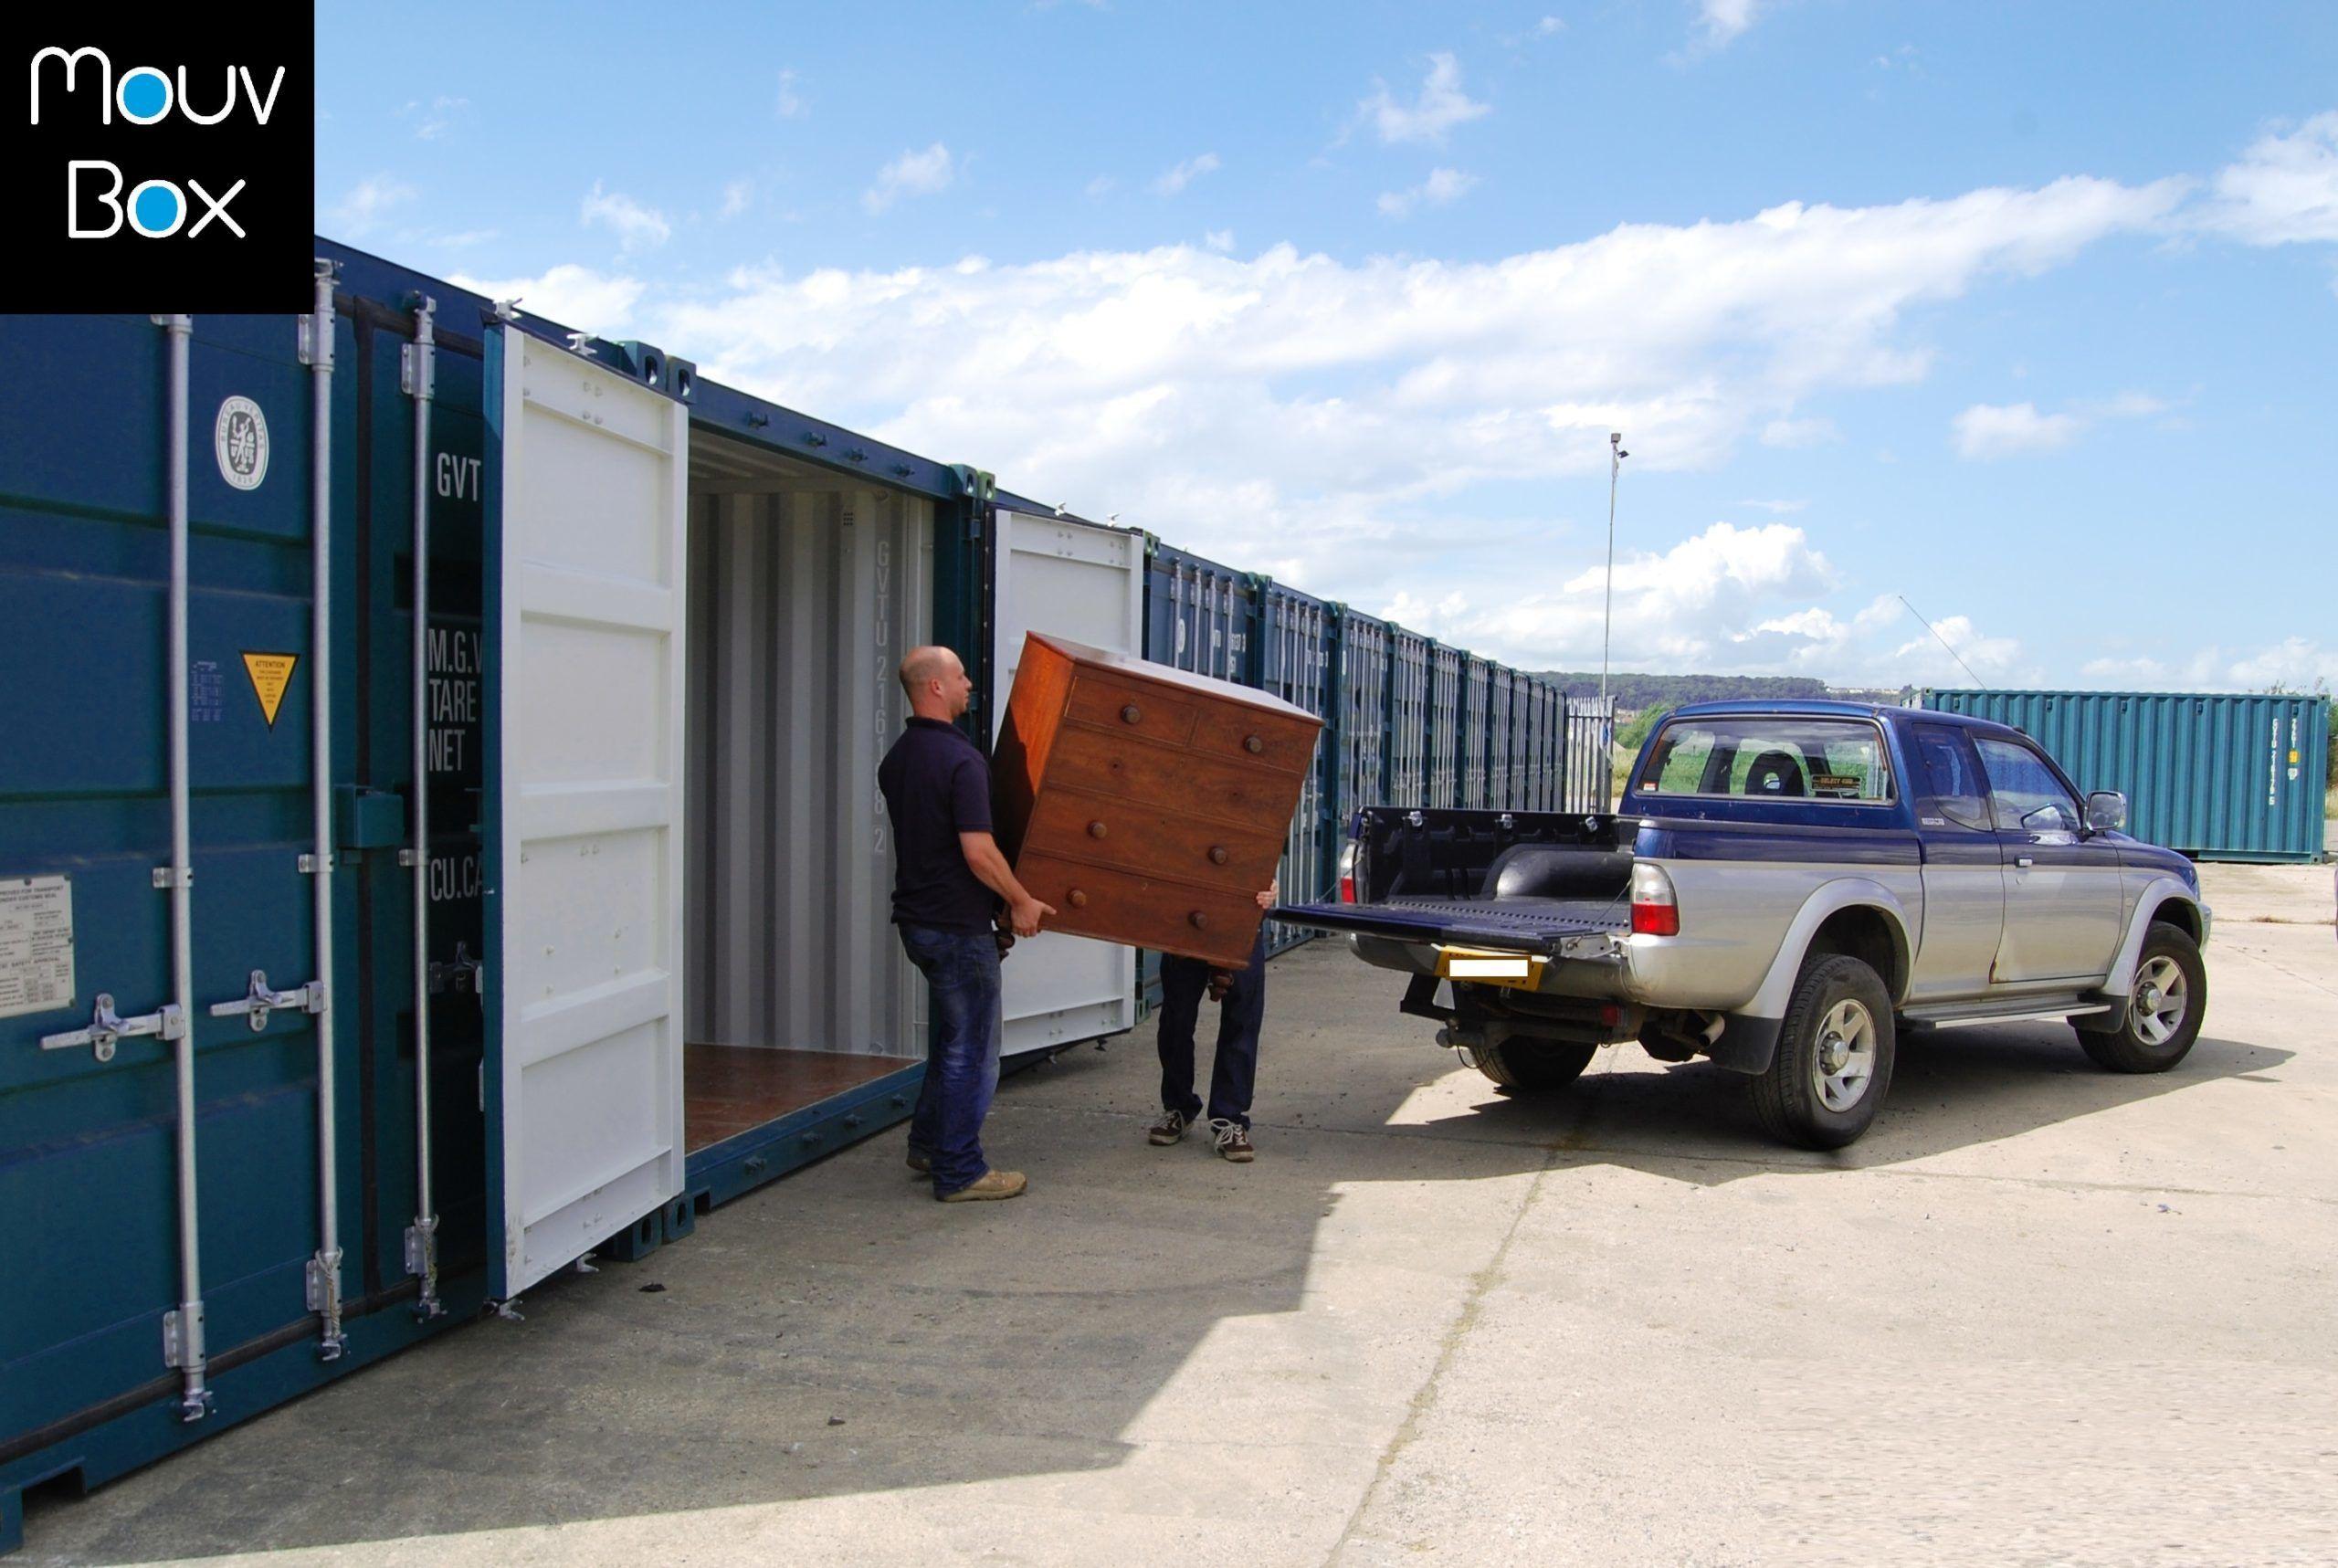 self stockage-garde meubles-container-conteneur-mouvbox